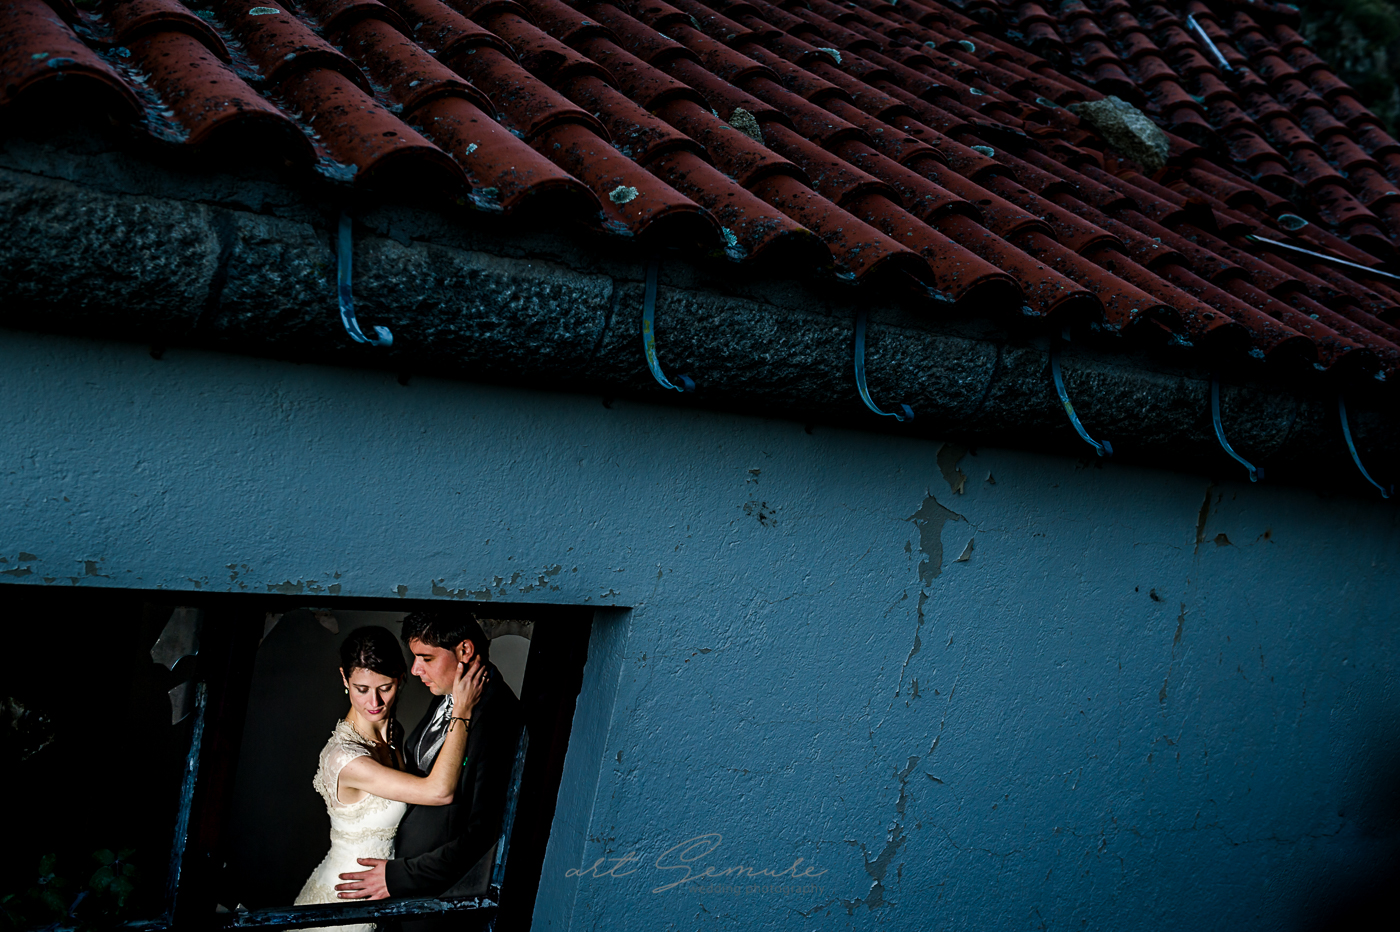 fotografo boda emotiva zamora salto de castro 19_